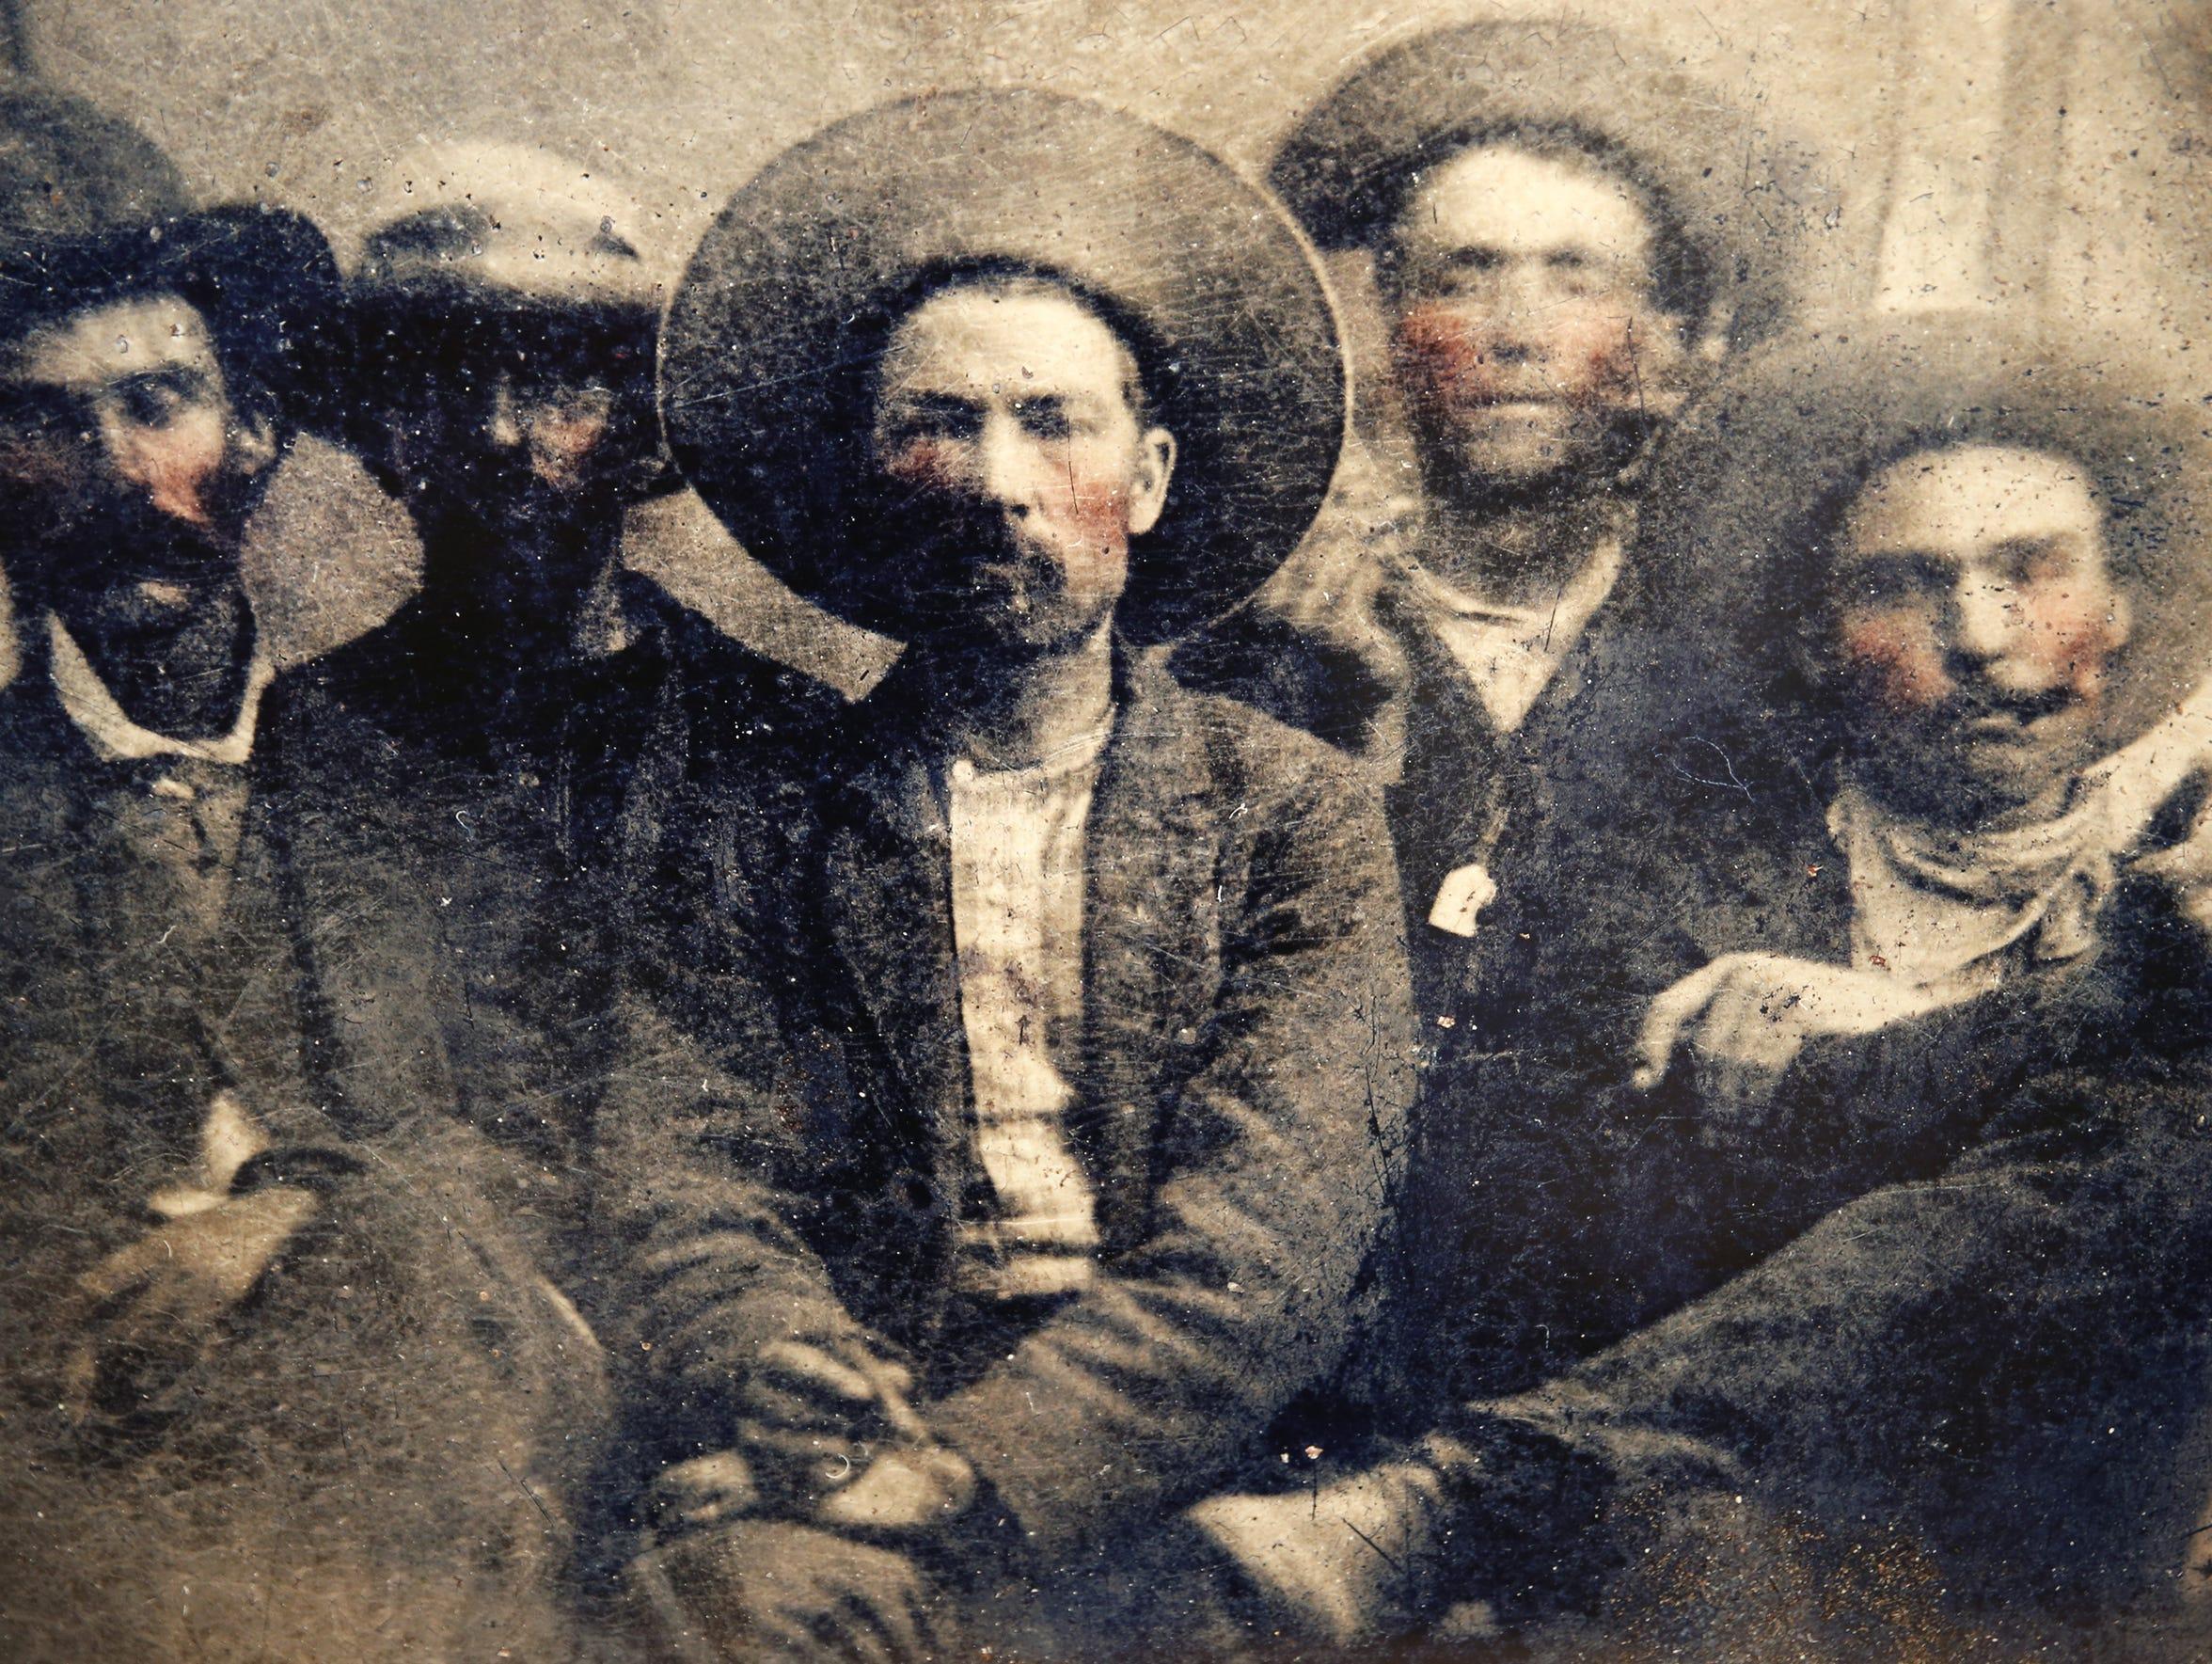 The men in the photo are:  Far left: Pat Garrett; middle: